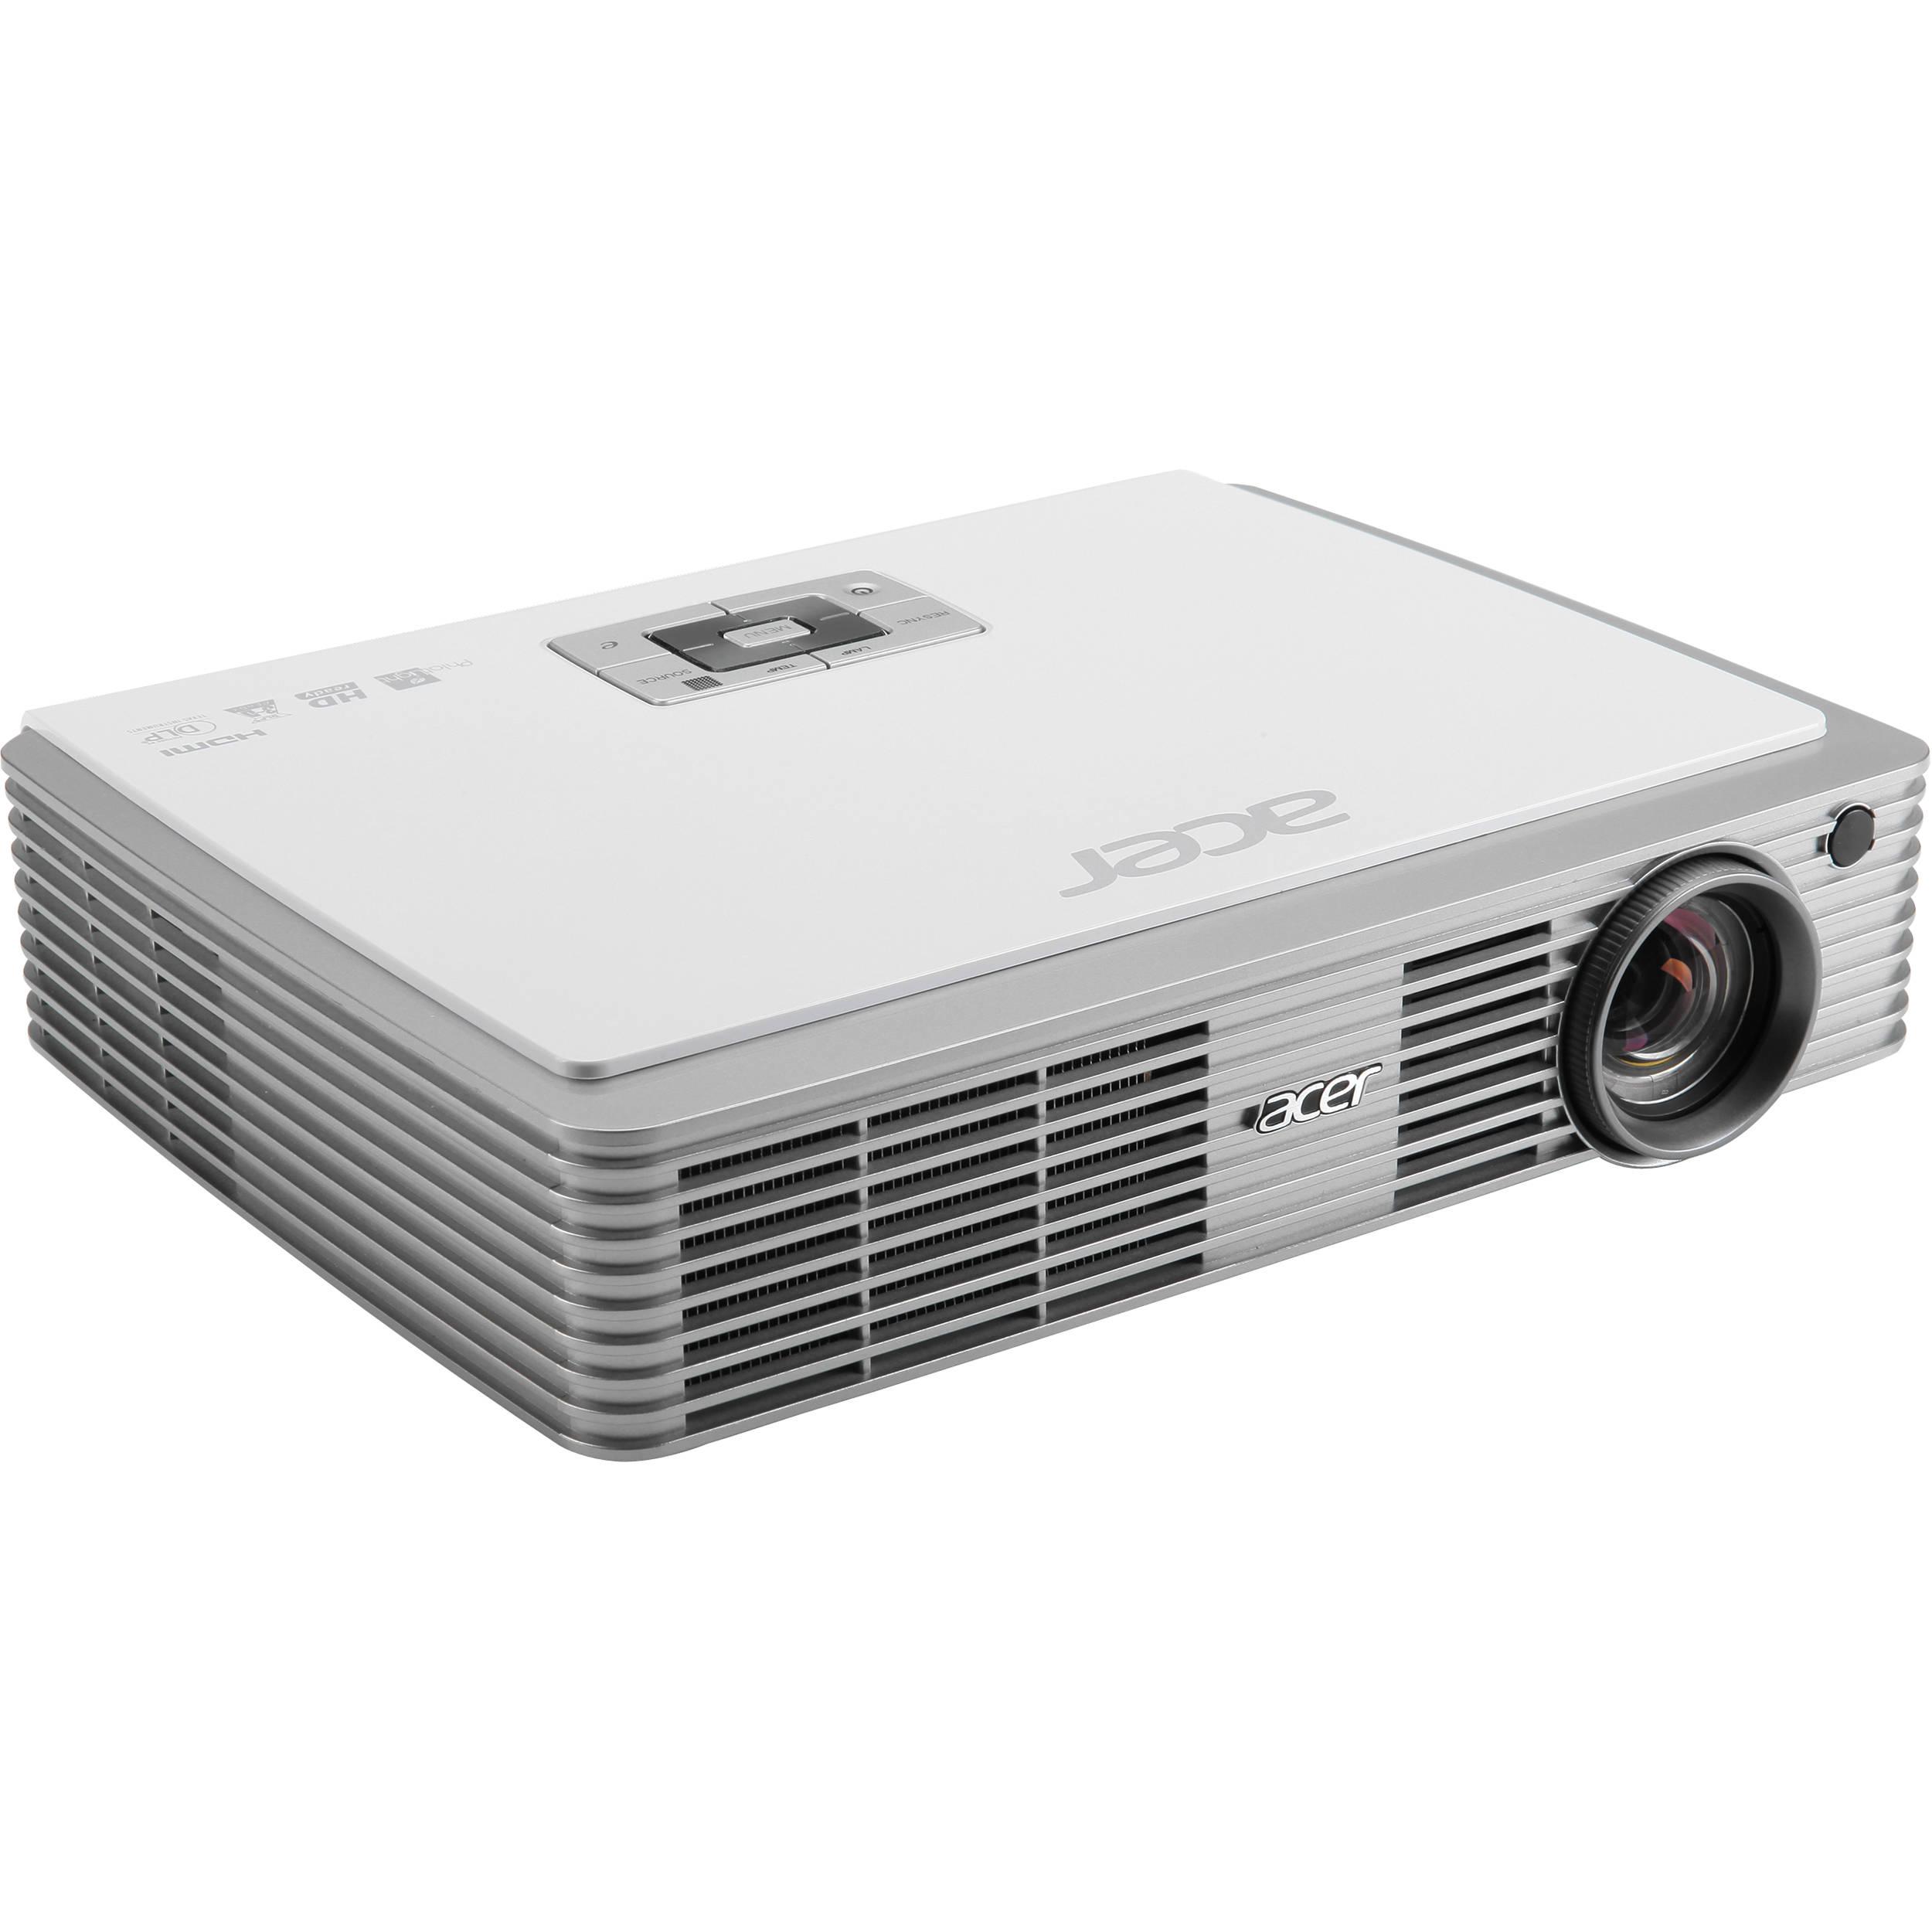 acer k330 dlp led 3d ready projector ey jcn01 008 b h photo rh bhphotovideo com Lenovo K330 Drivers Lenovo K330 Drivers